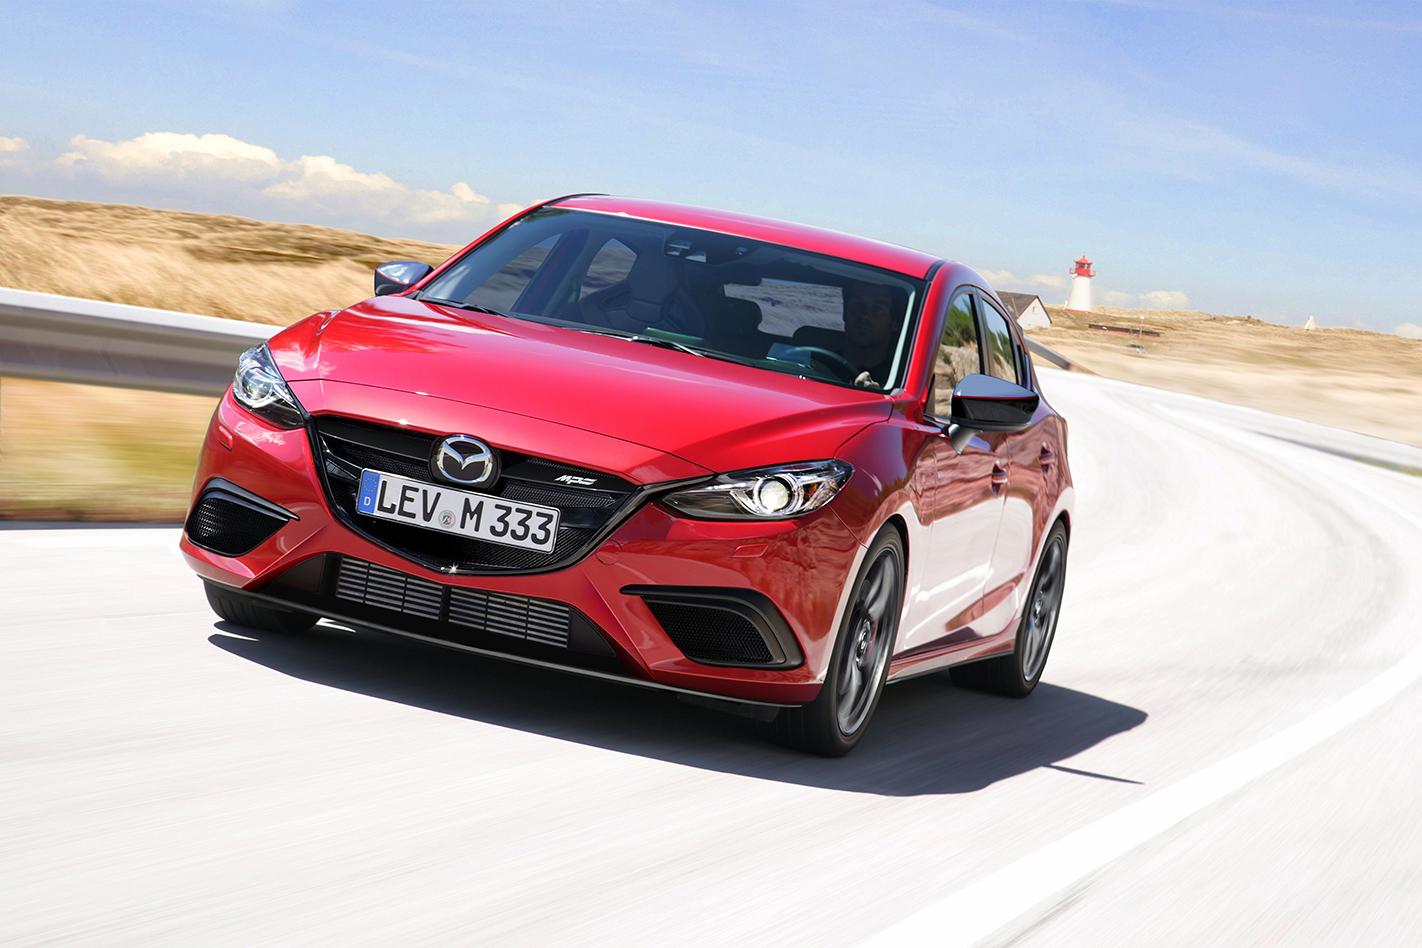 2016 Mazda 3 MPS